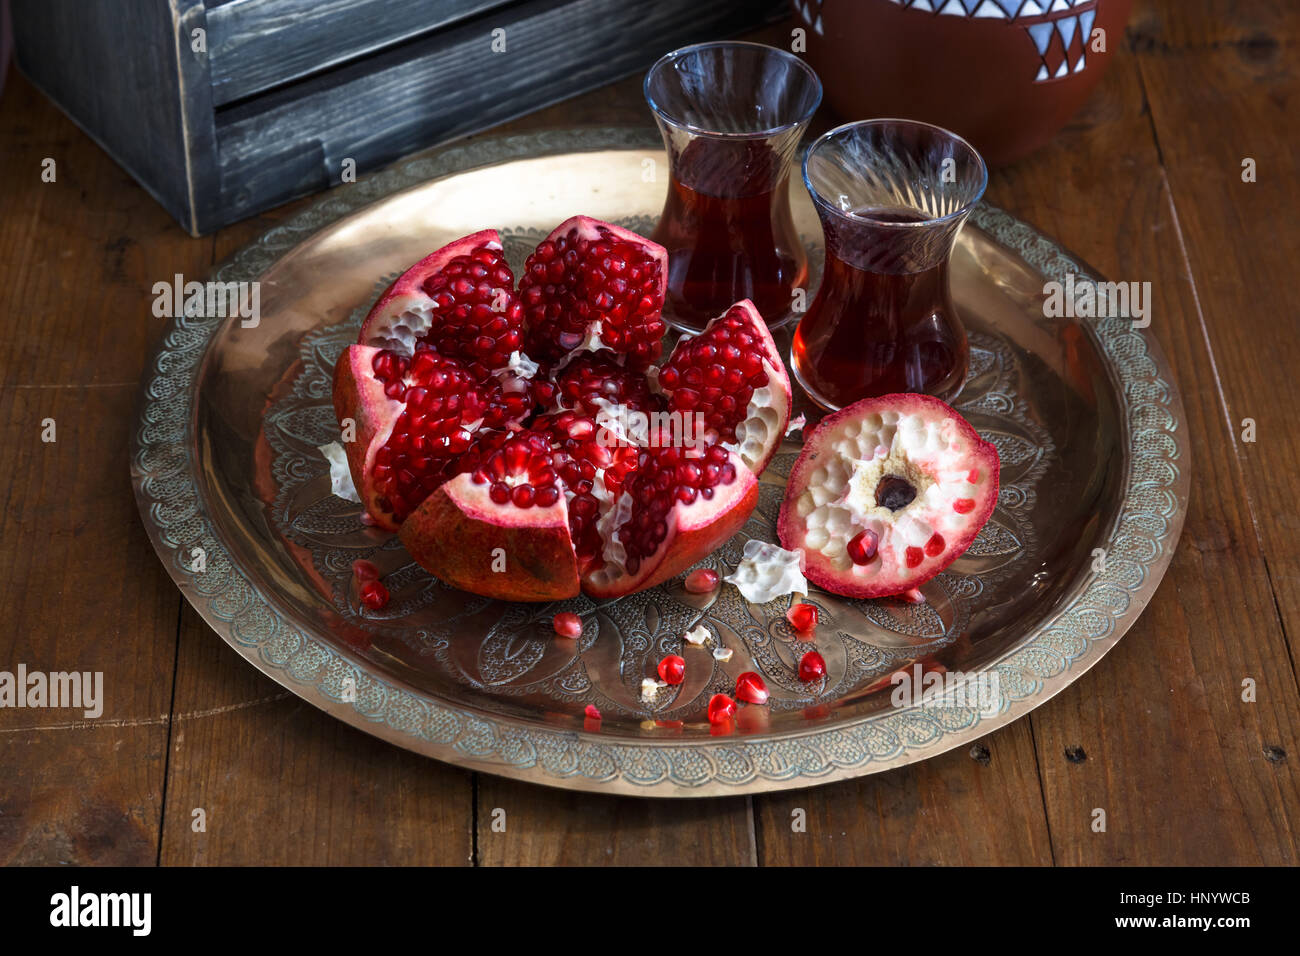 ripe pomegranate on copper plate on a dark background, close view Stock Photo